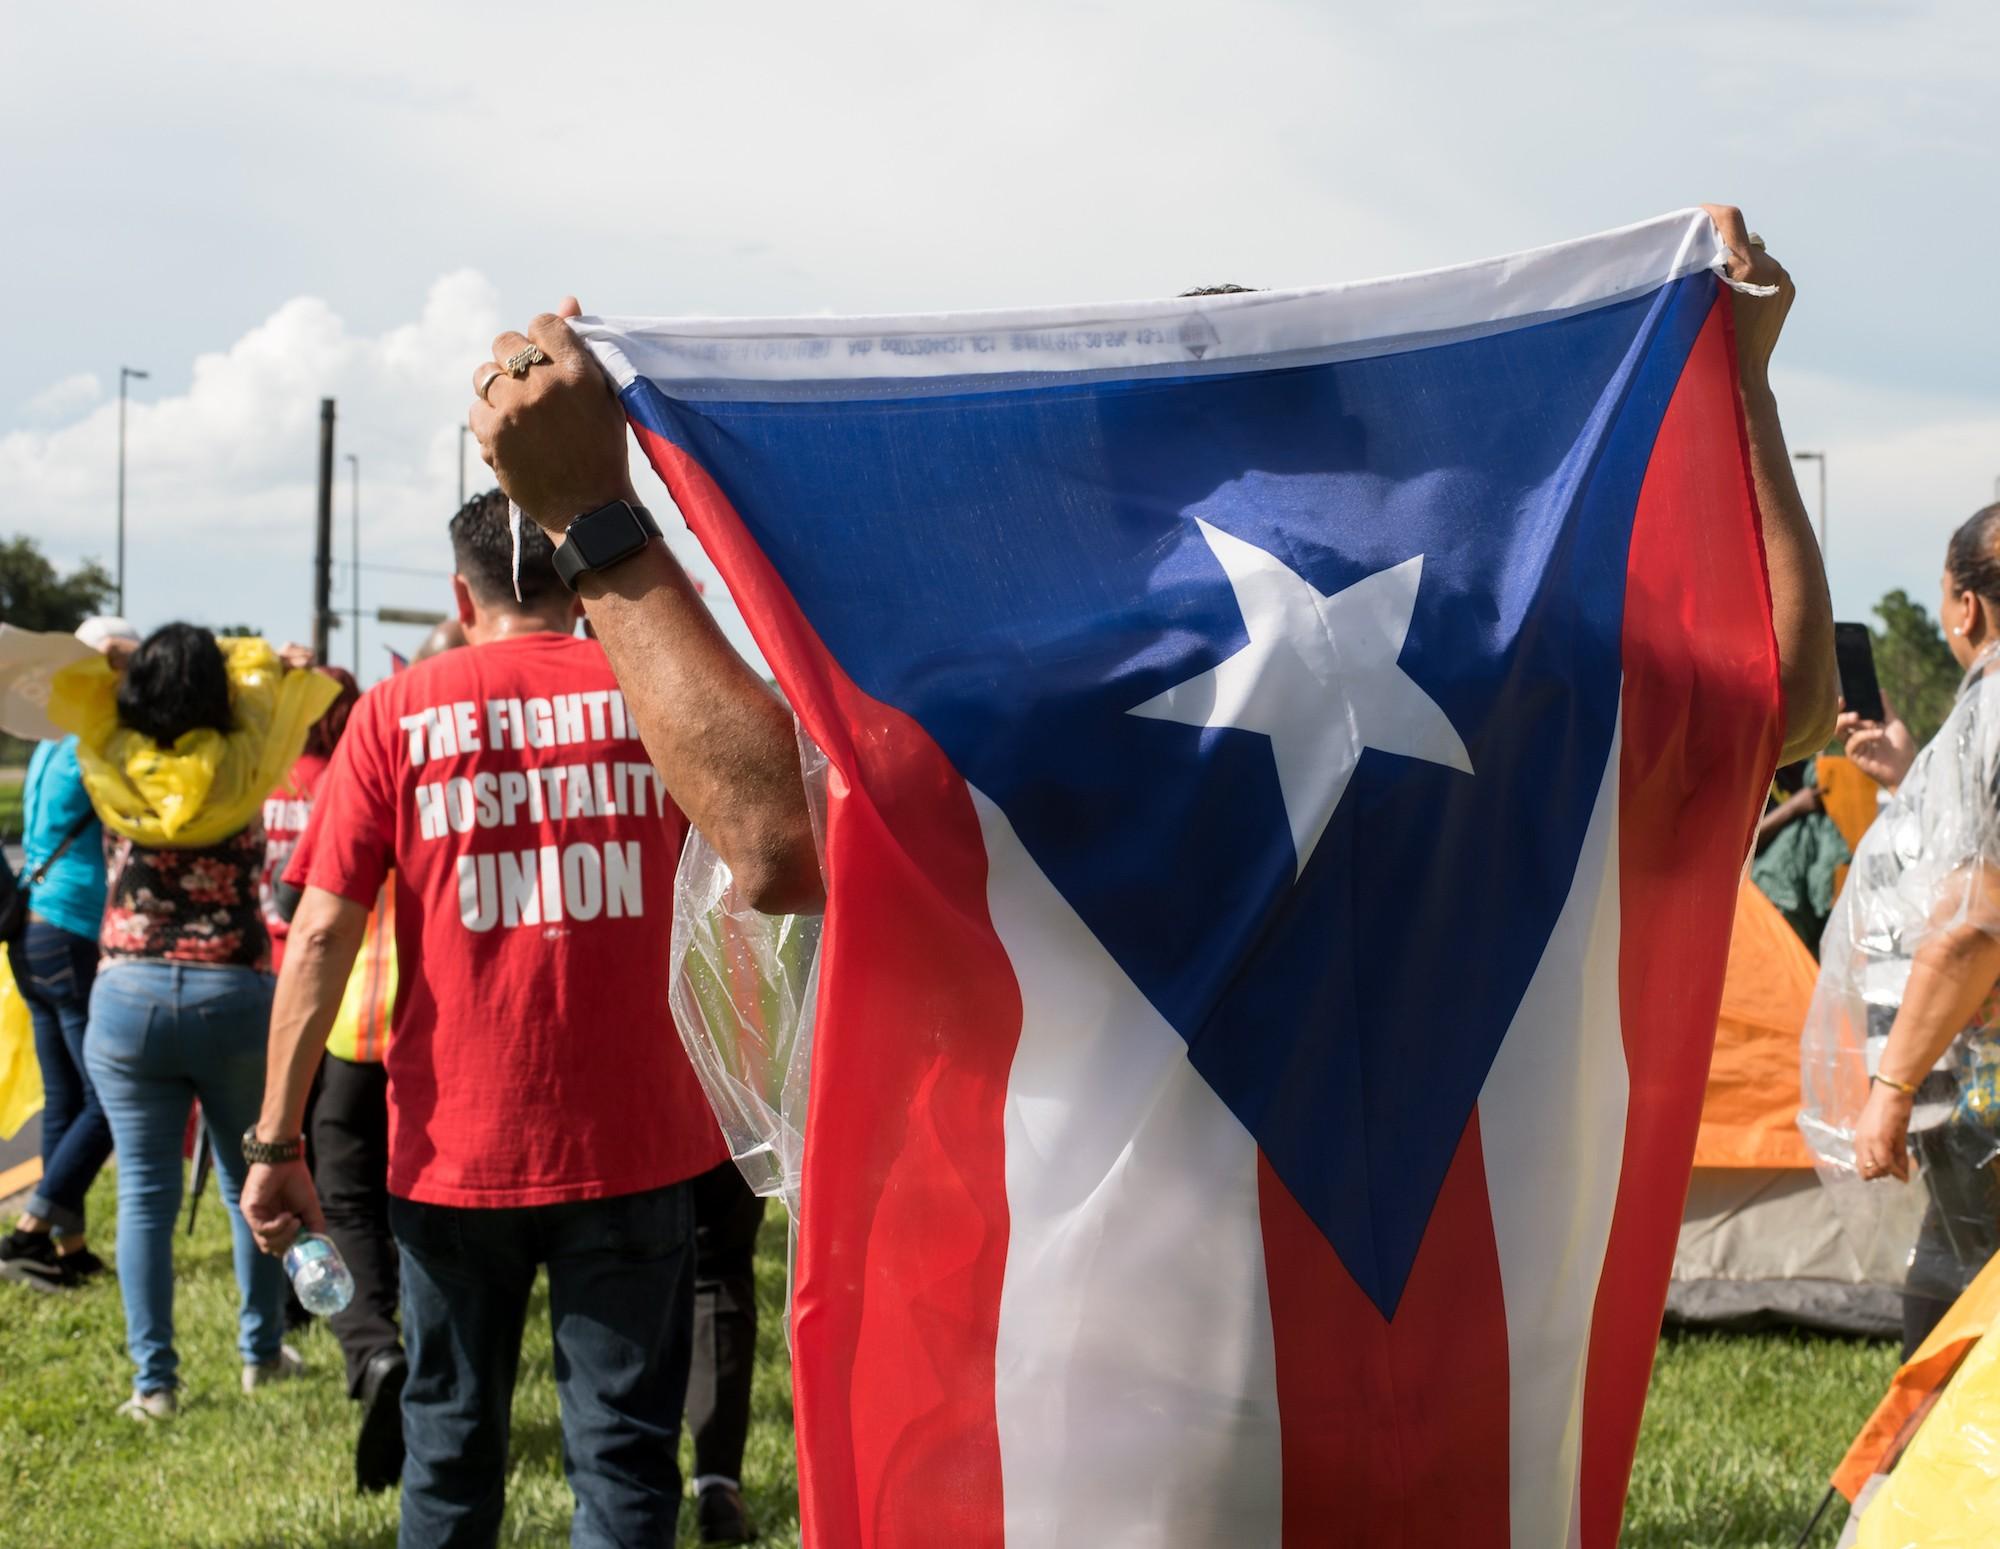 Puerto Rican evacuees set up 'tent city' to demand Rick